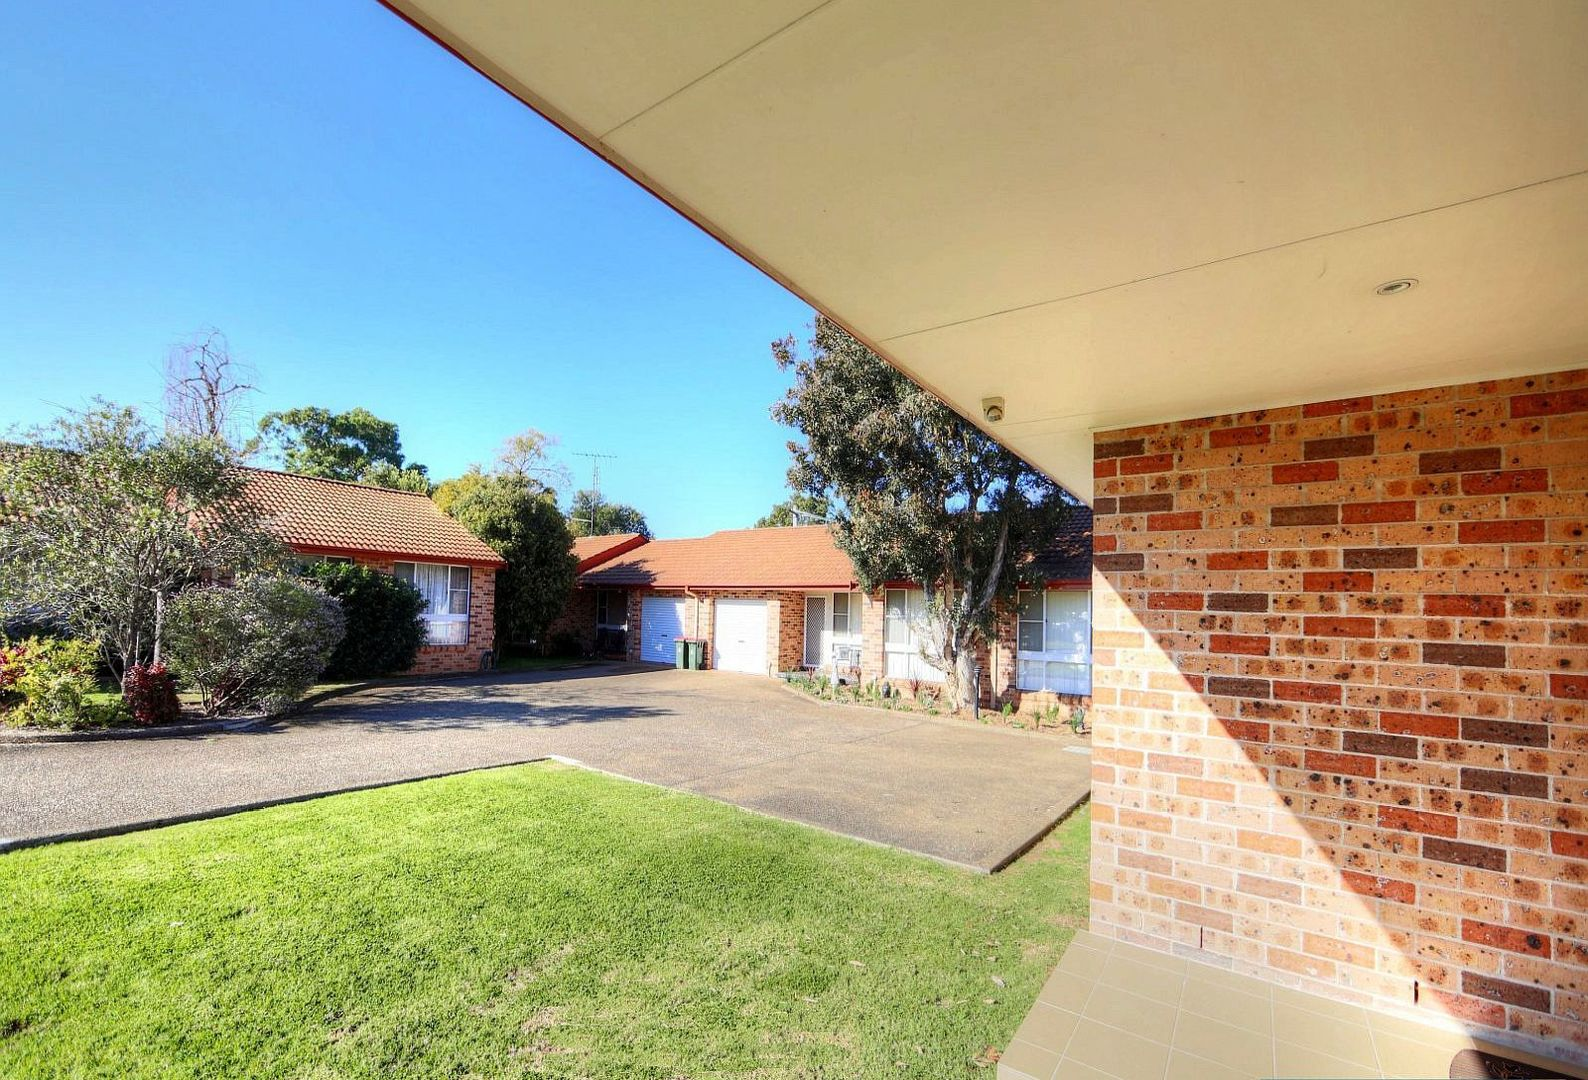 24 Station St, Douglas Park NSW 2569, Image 2